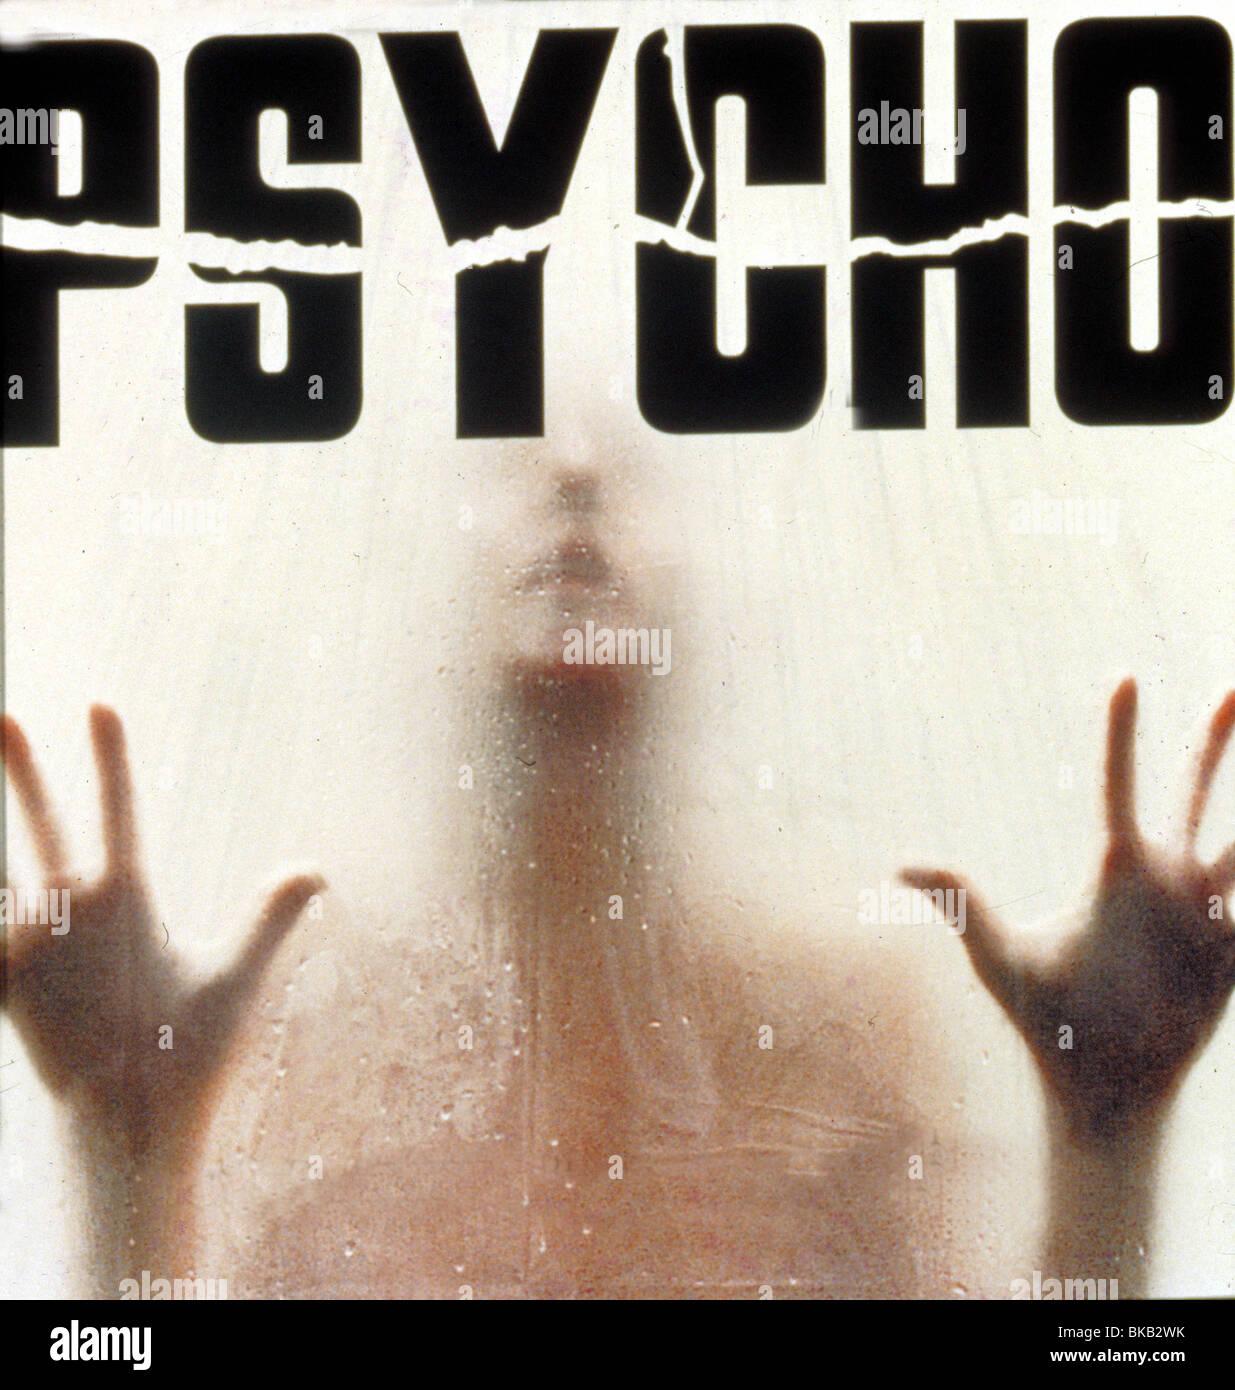 Psycho Film Poster Stock Photos & Psycho Film Poster Stock